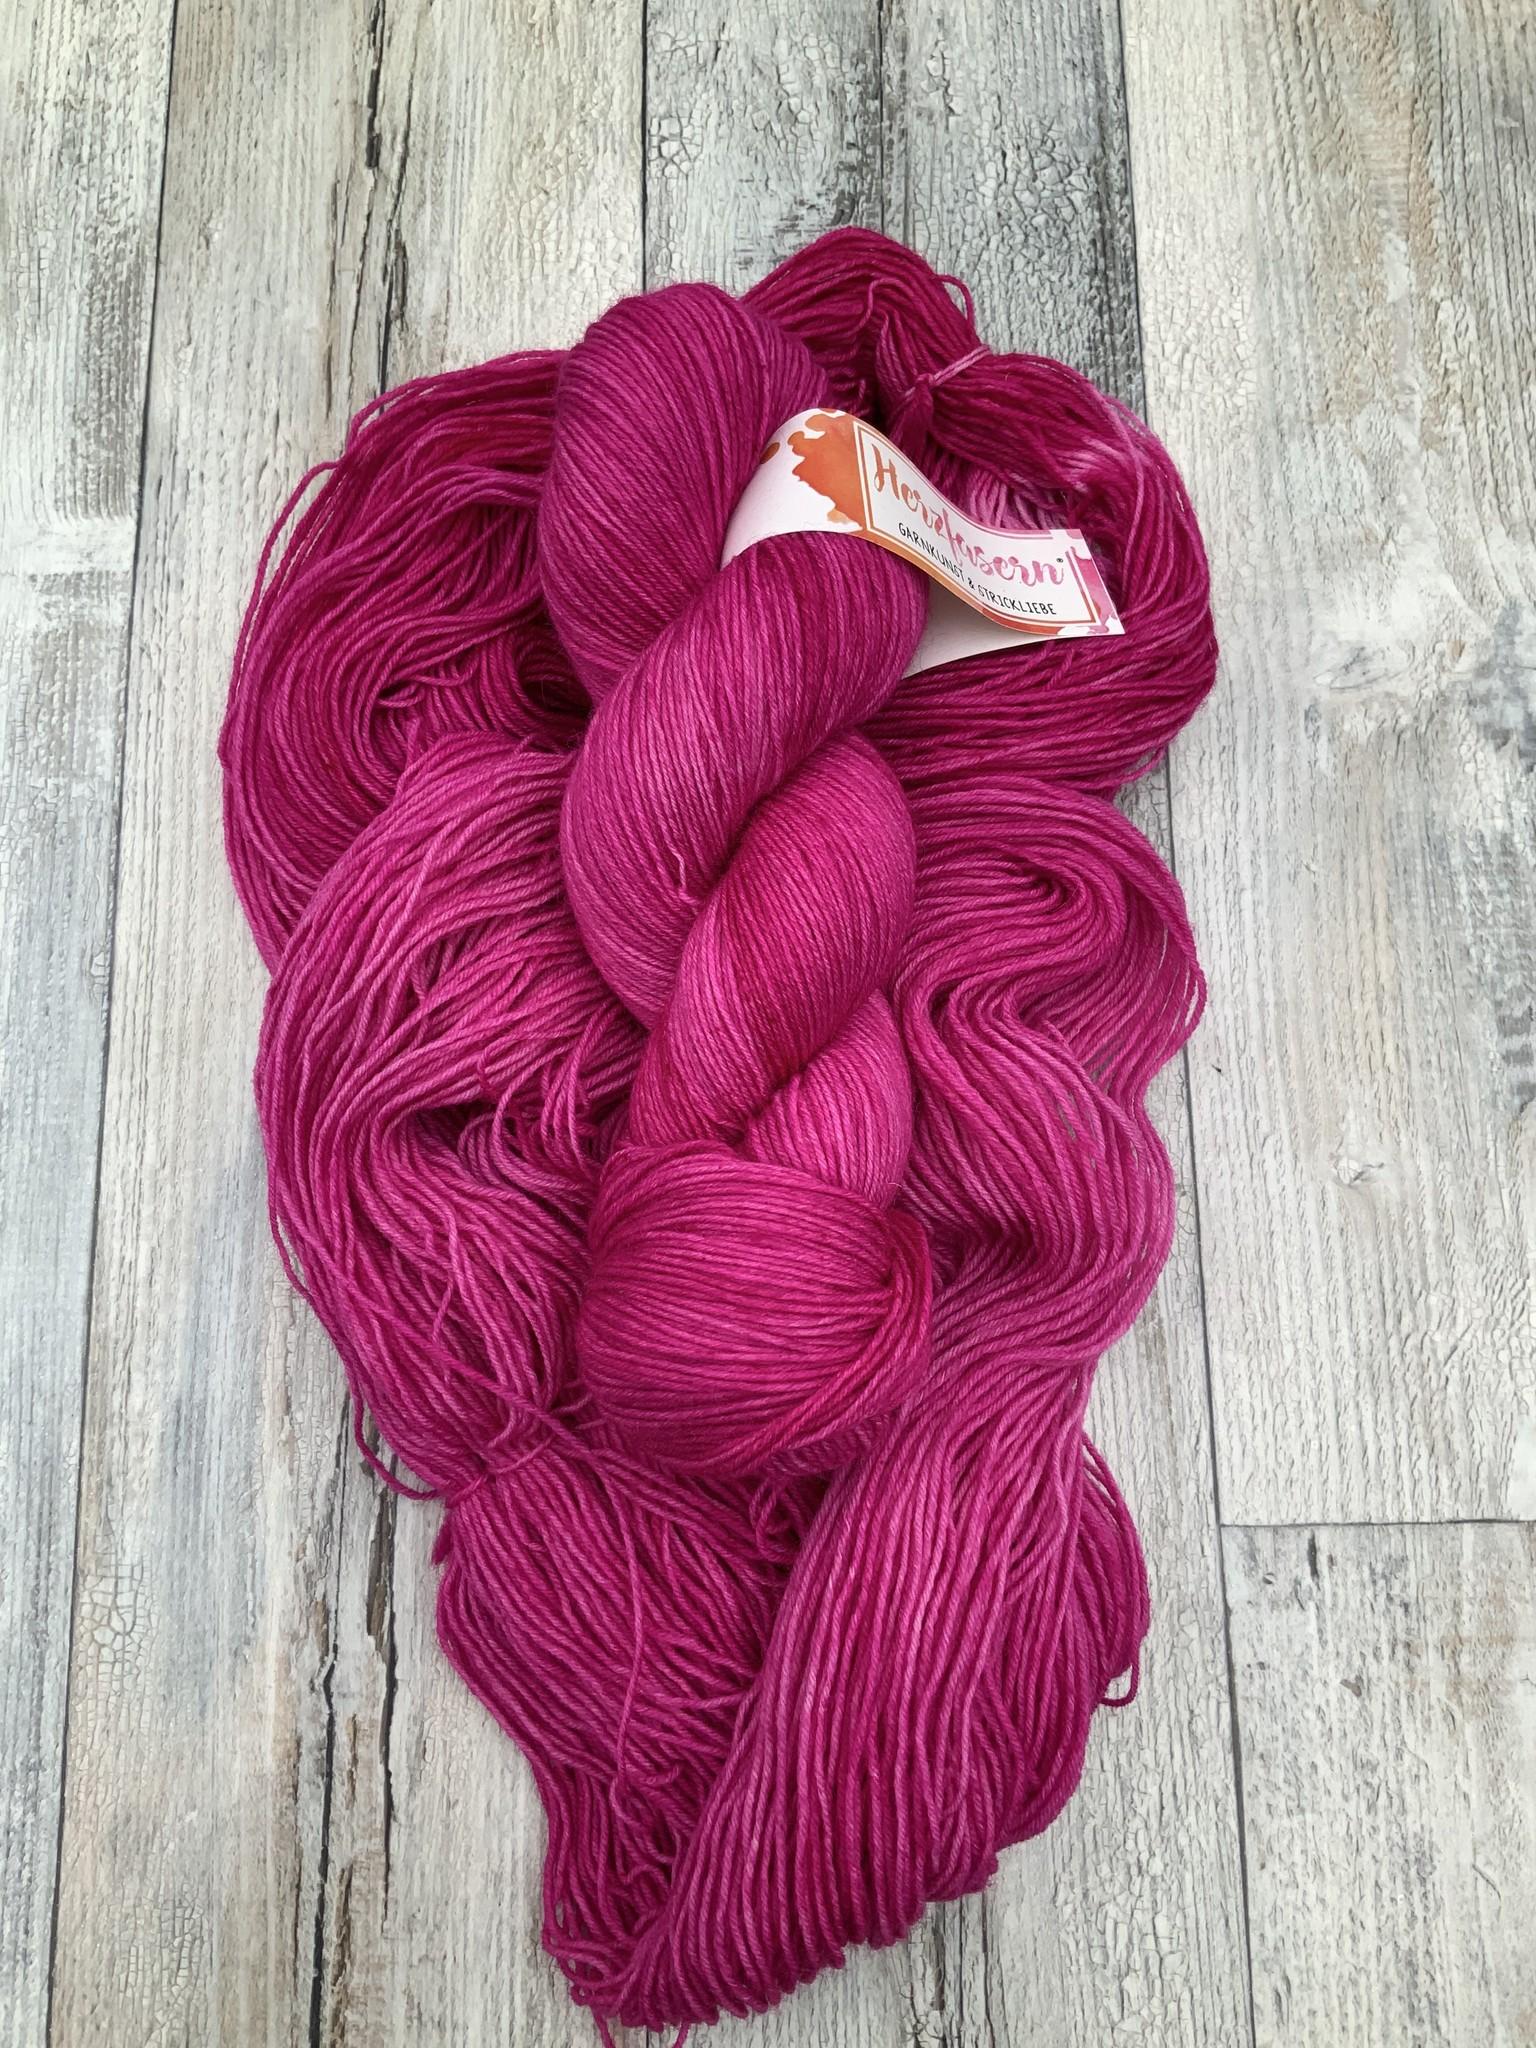 Herzfasern Sockenwolle - Berry